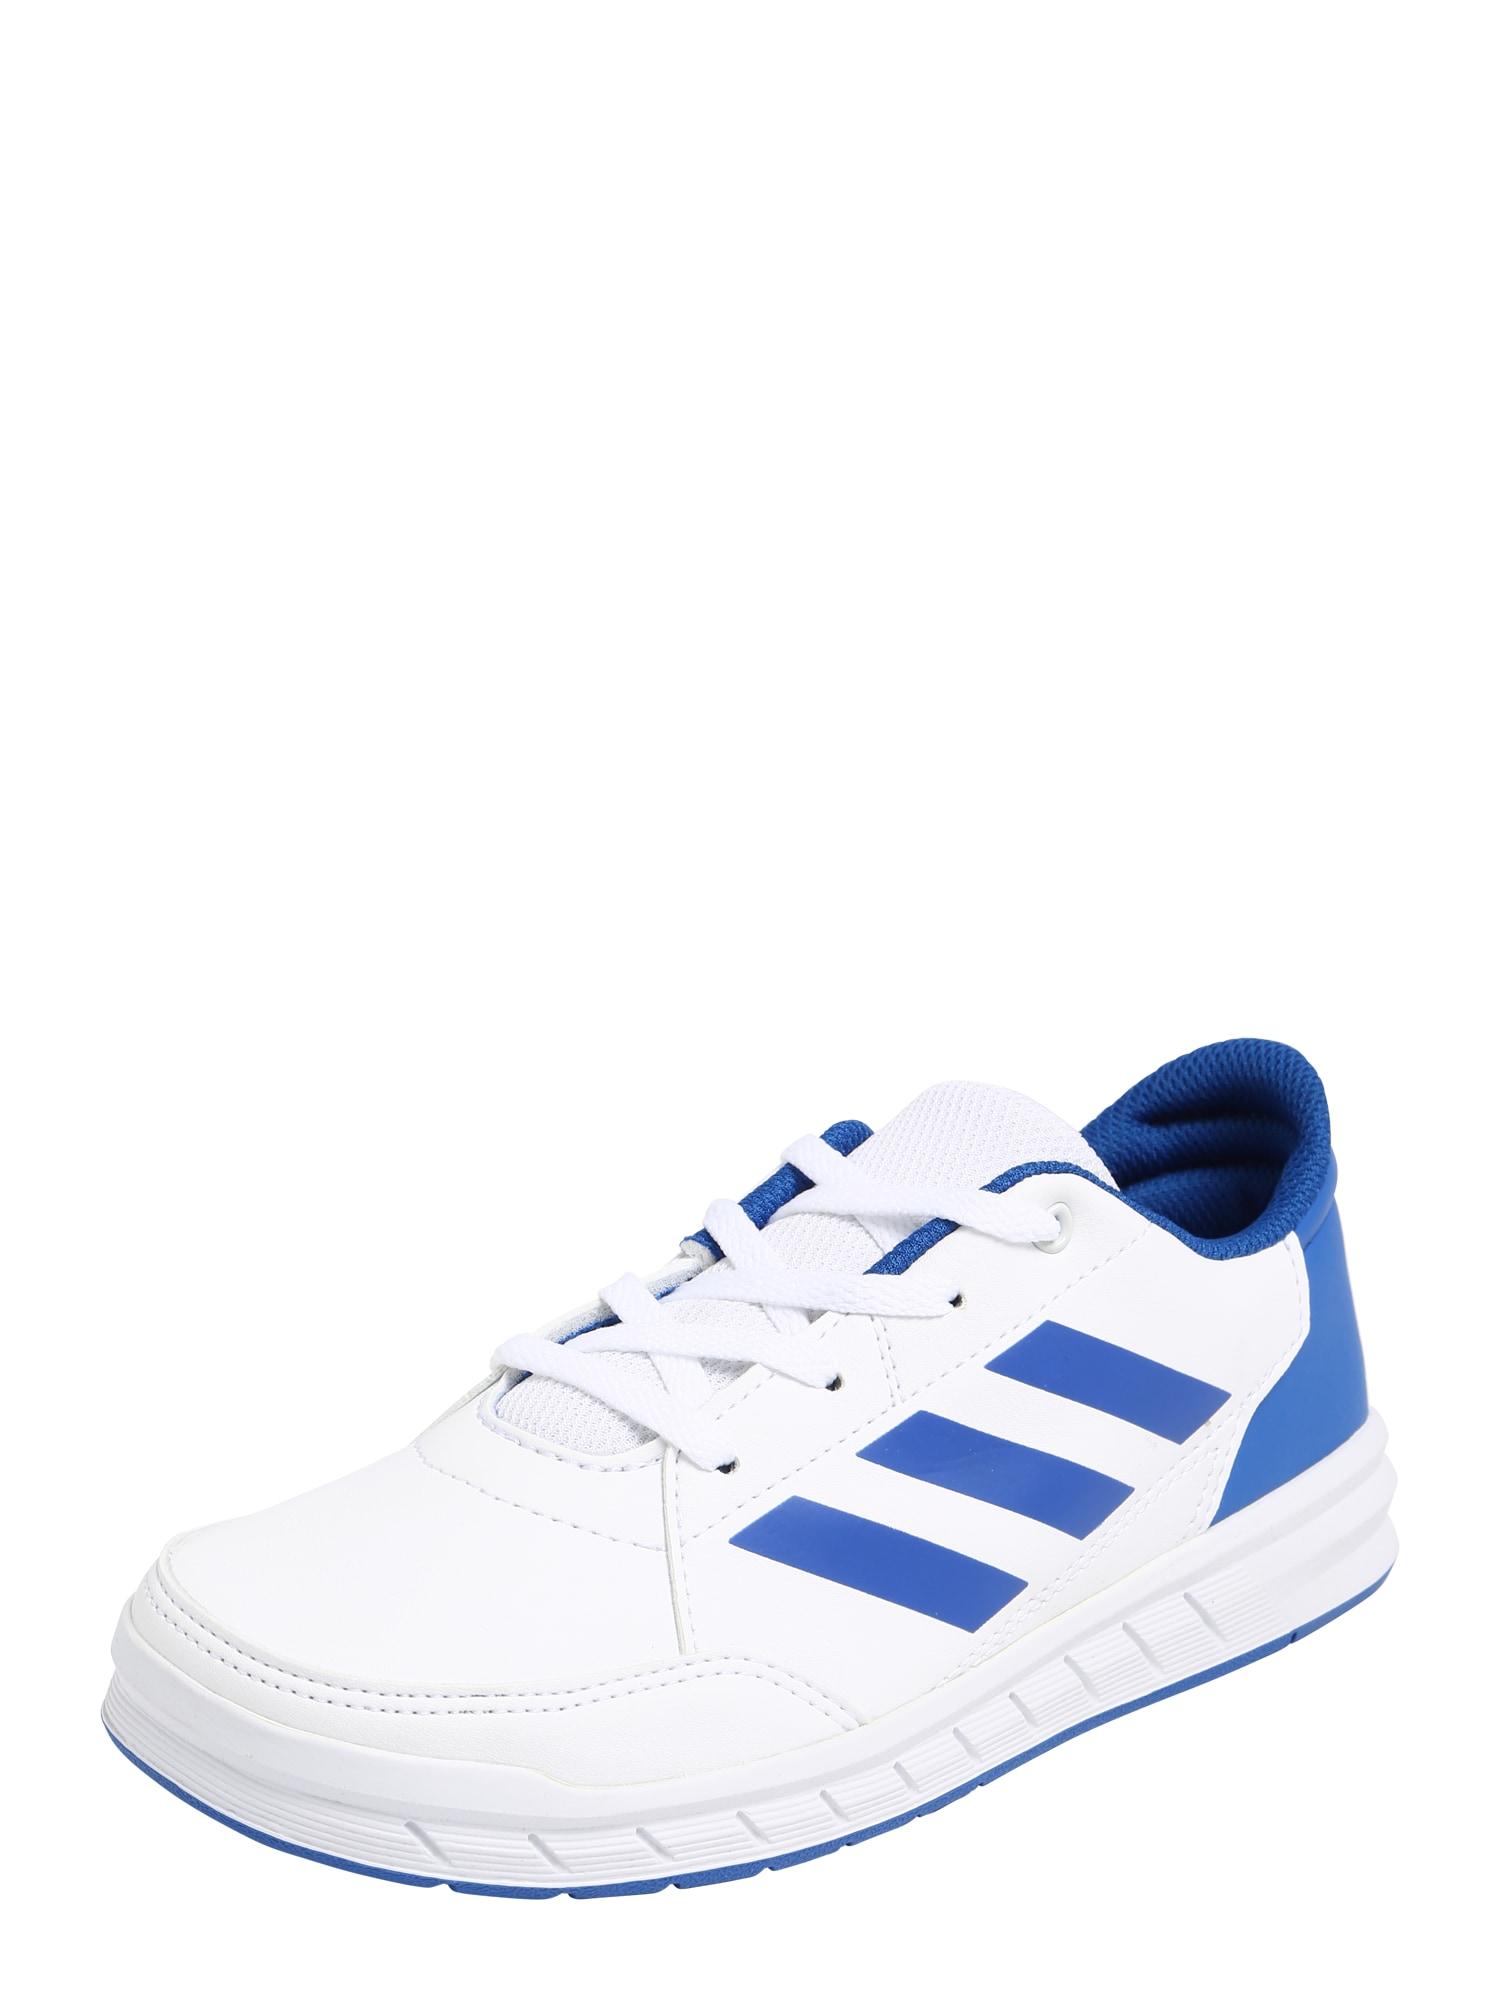 Sportovní boty Alta Sport K modrá bílá ADIDAS PERFORMANCE